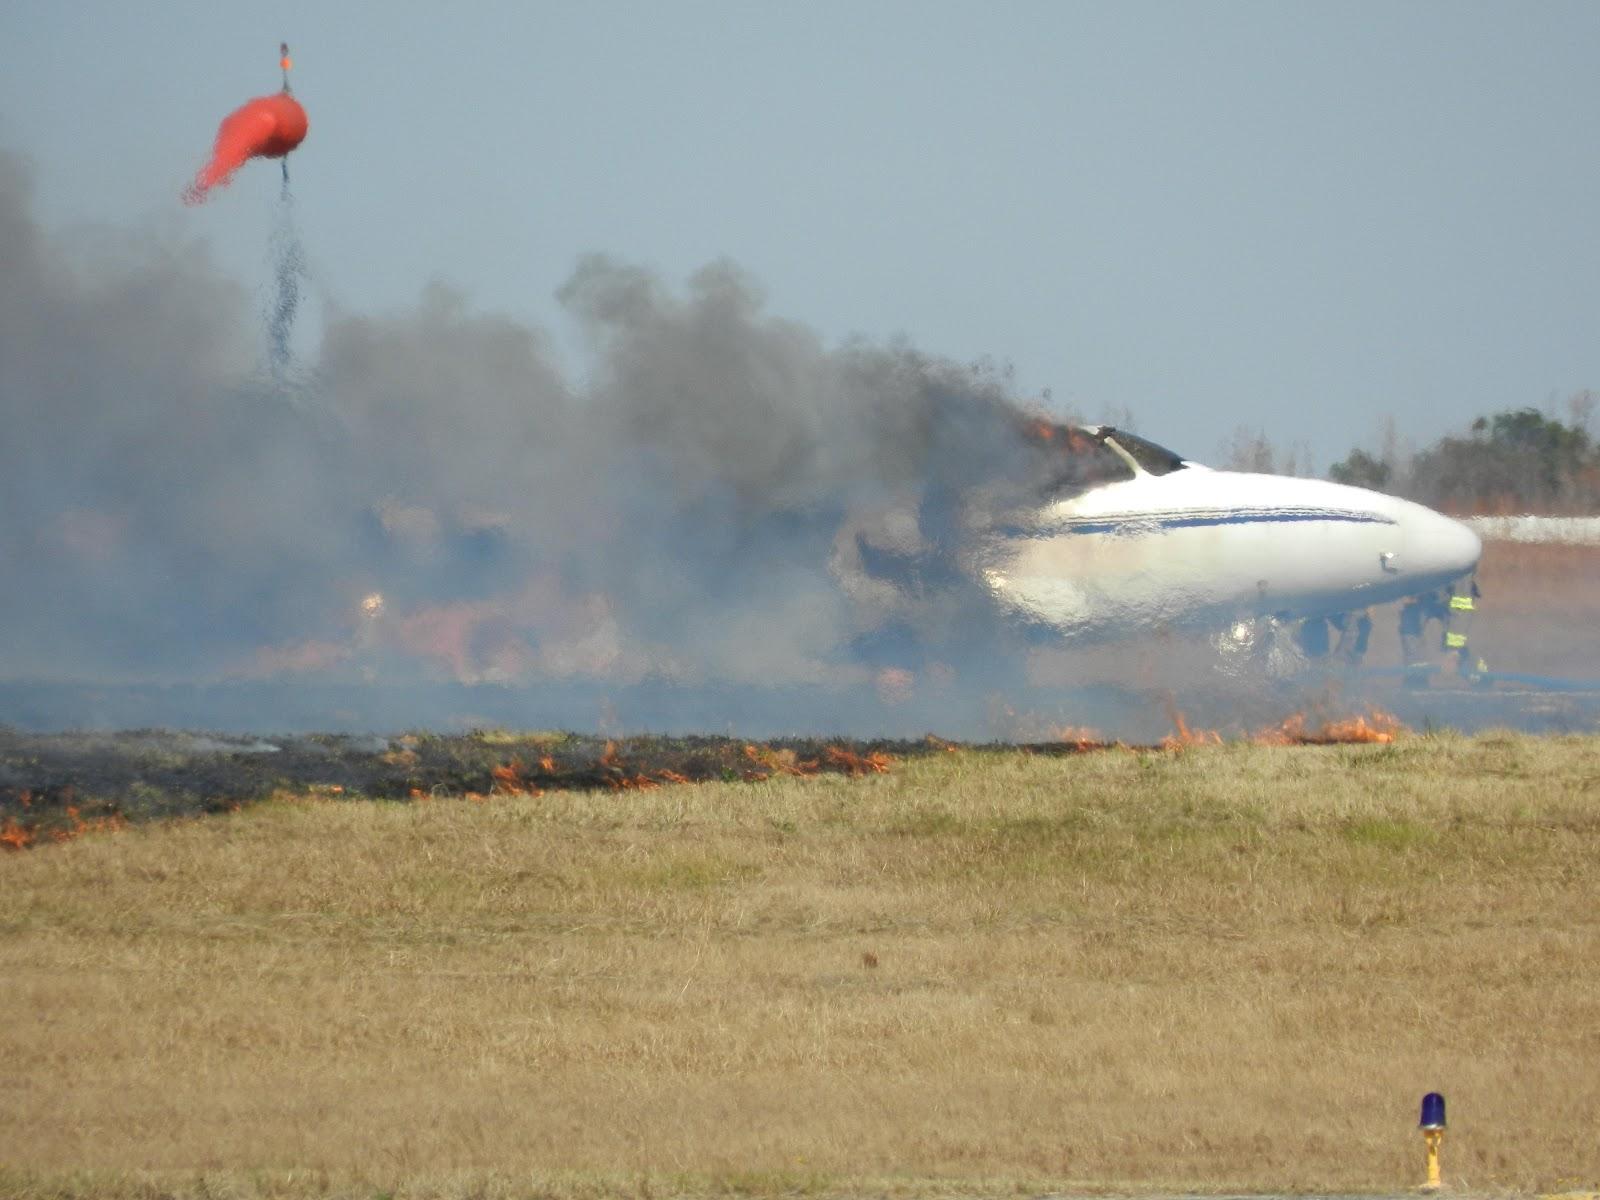 http://2.bp.blogspot.com/-1sHbUbvqdiQ/UKjm894lSZI/AAAAAAAAcsc/0S7XgJaZQ5o/s1600/greenwood-plane-crash-photos-taken-alfred-langley.jpg